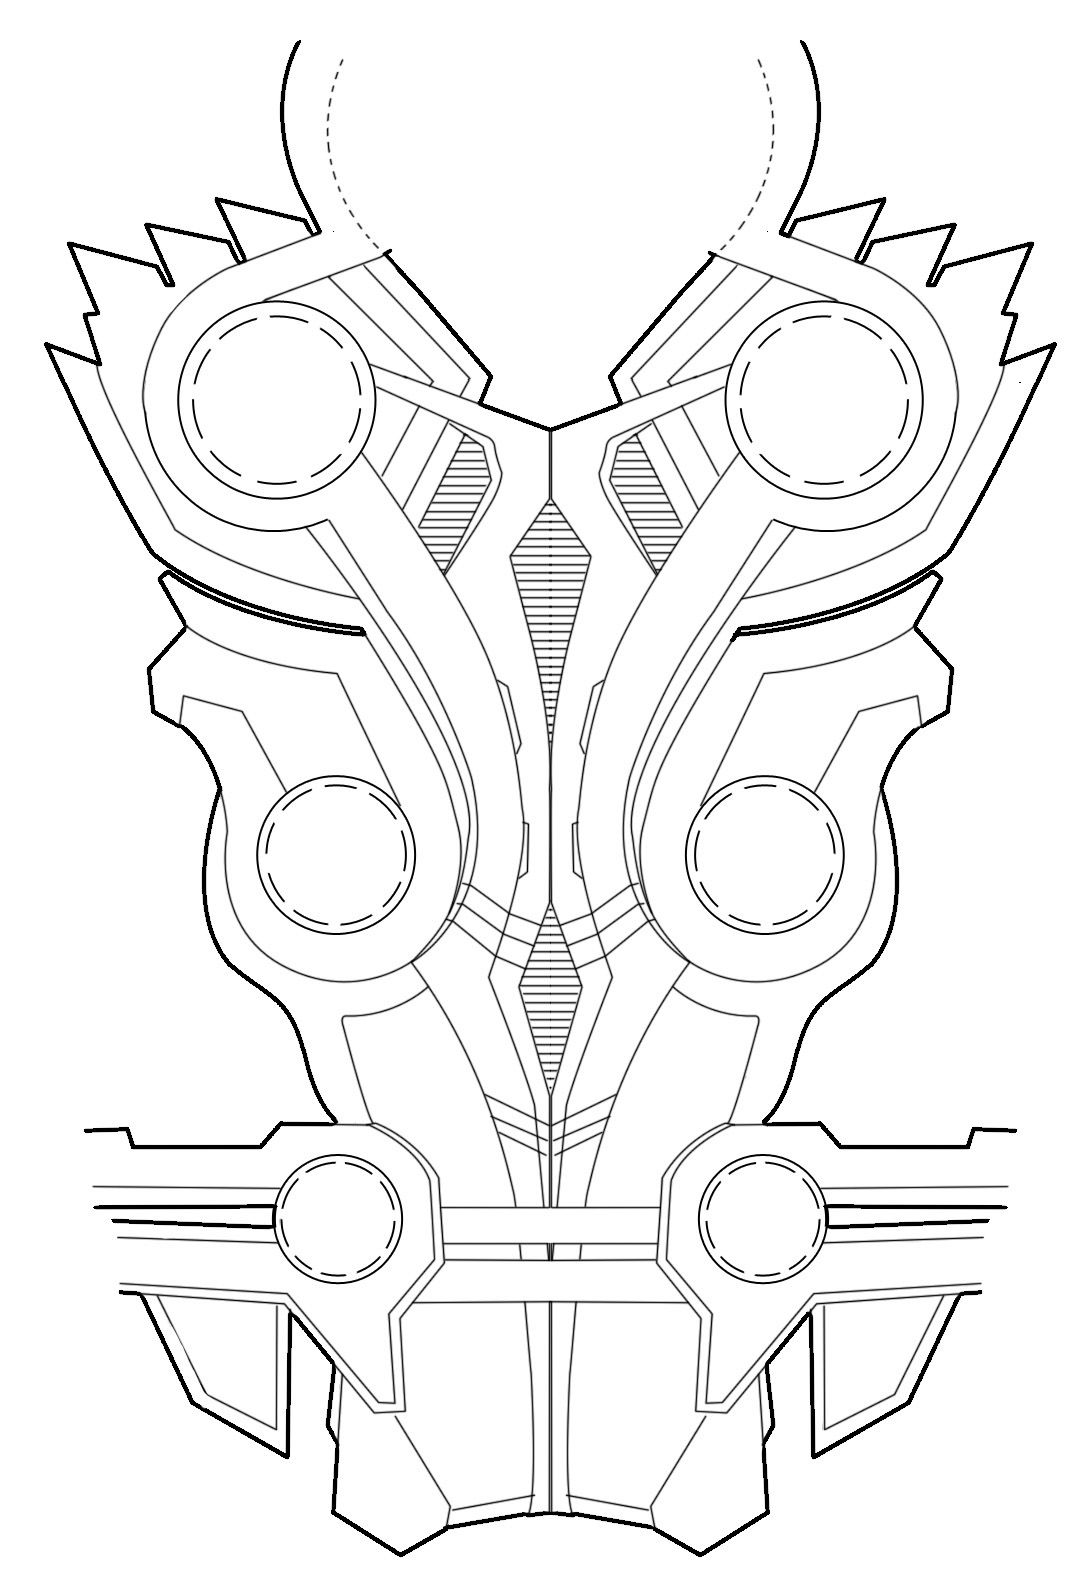 Thor Avengers Budget Foam Armour Tumblr M932xejsu01re0ktno1 R1 D 1 091